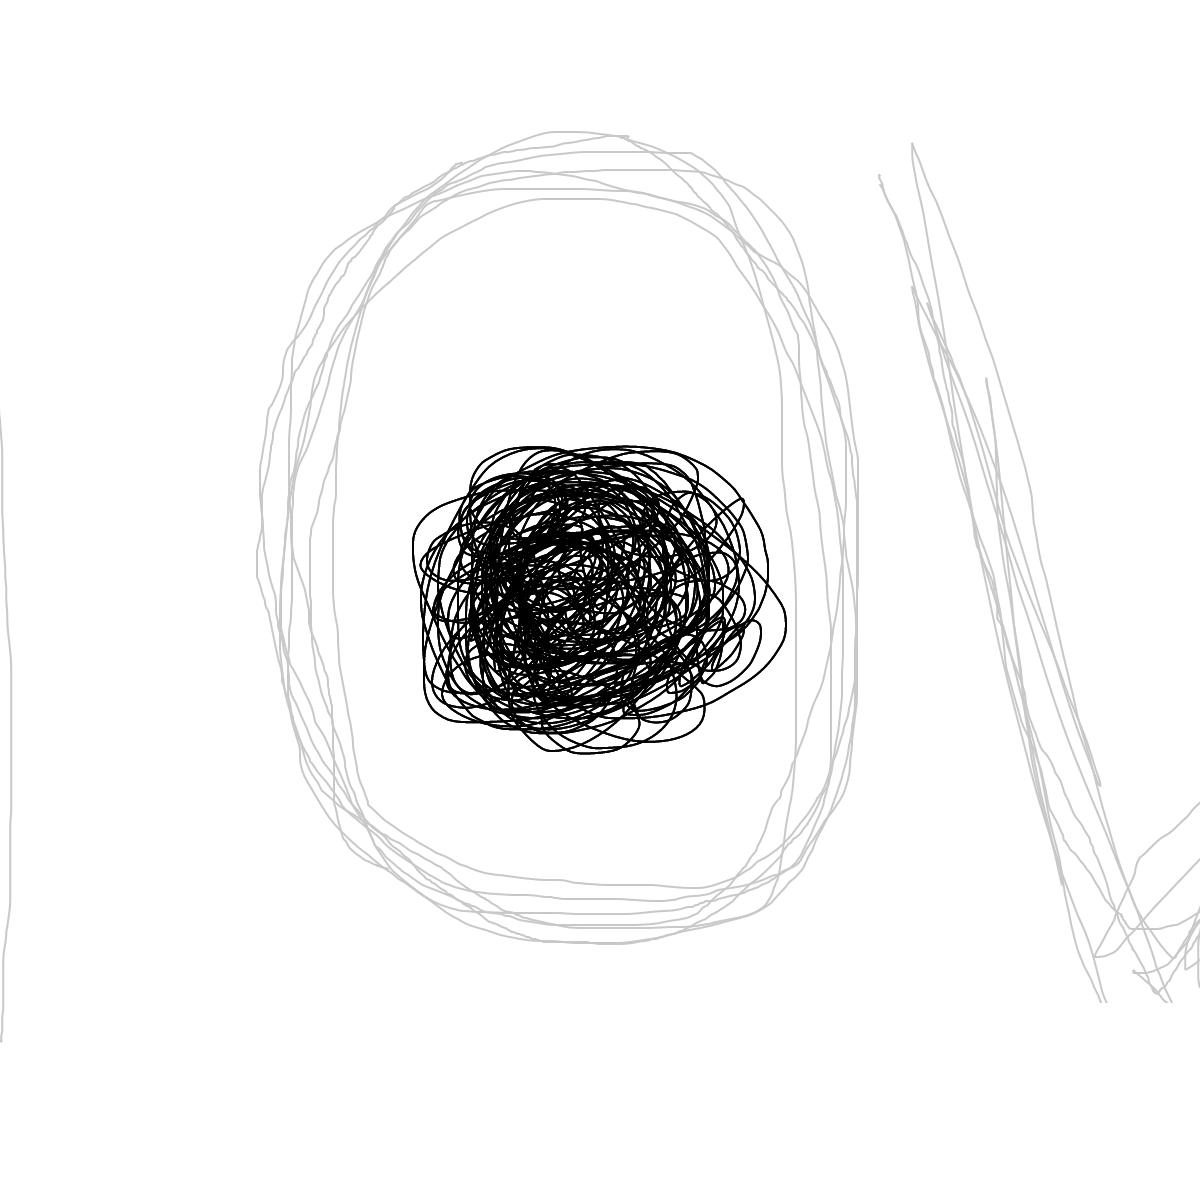 BAAAM drawing#23252 lat:52.4744415283203100lng: 13.4076585769653320